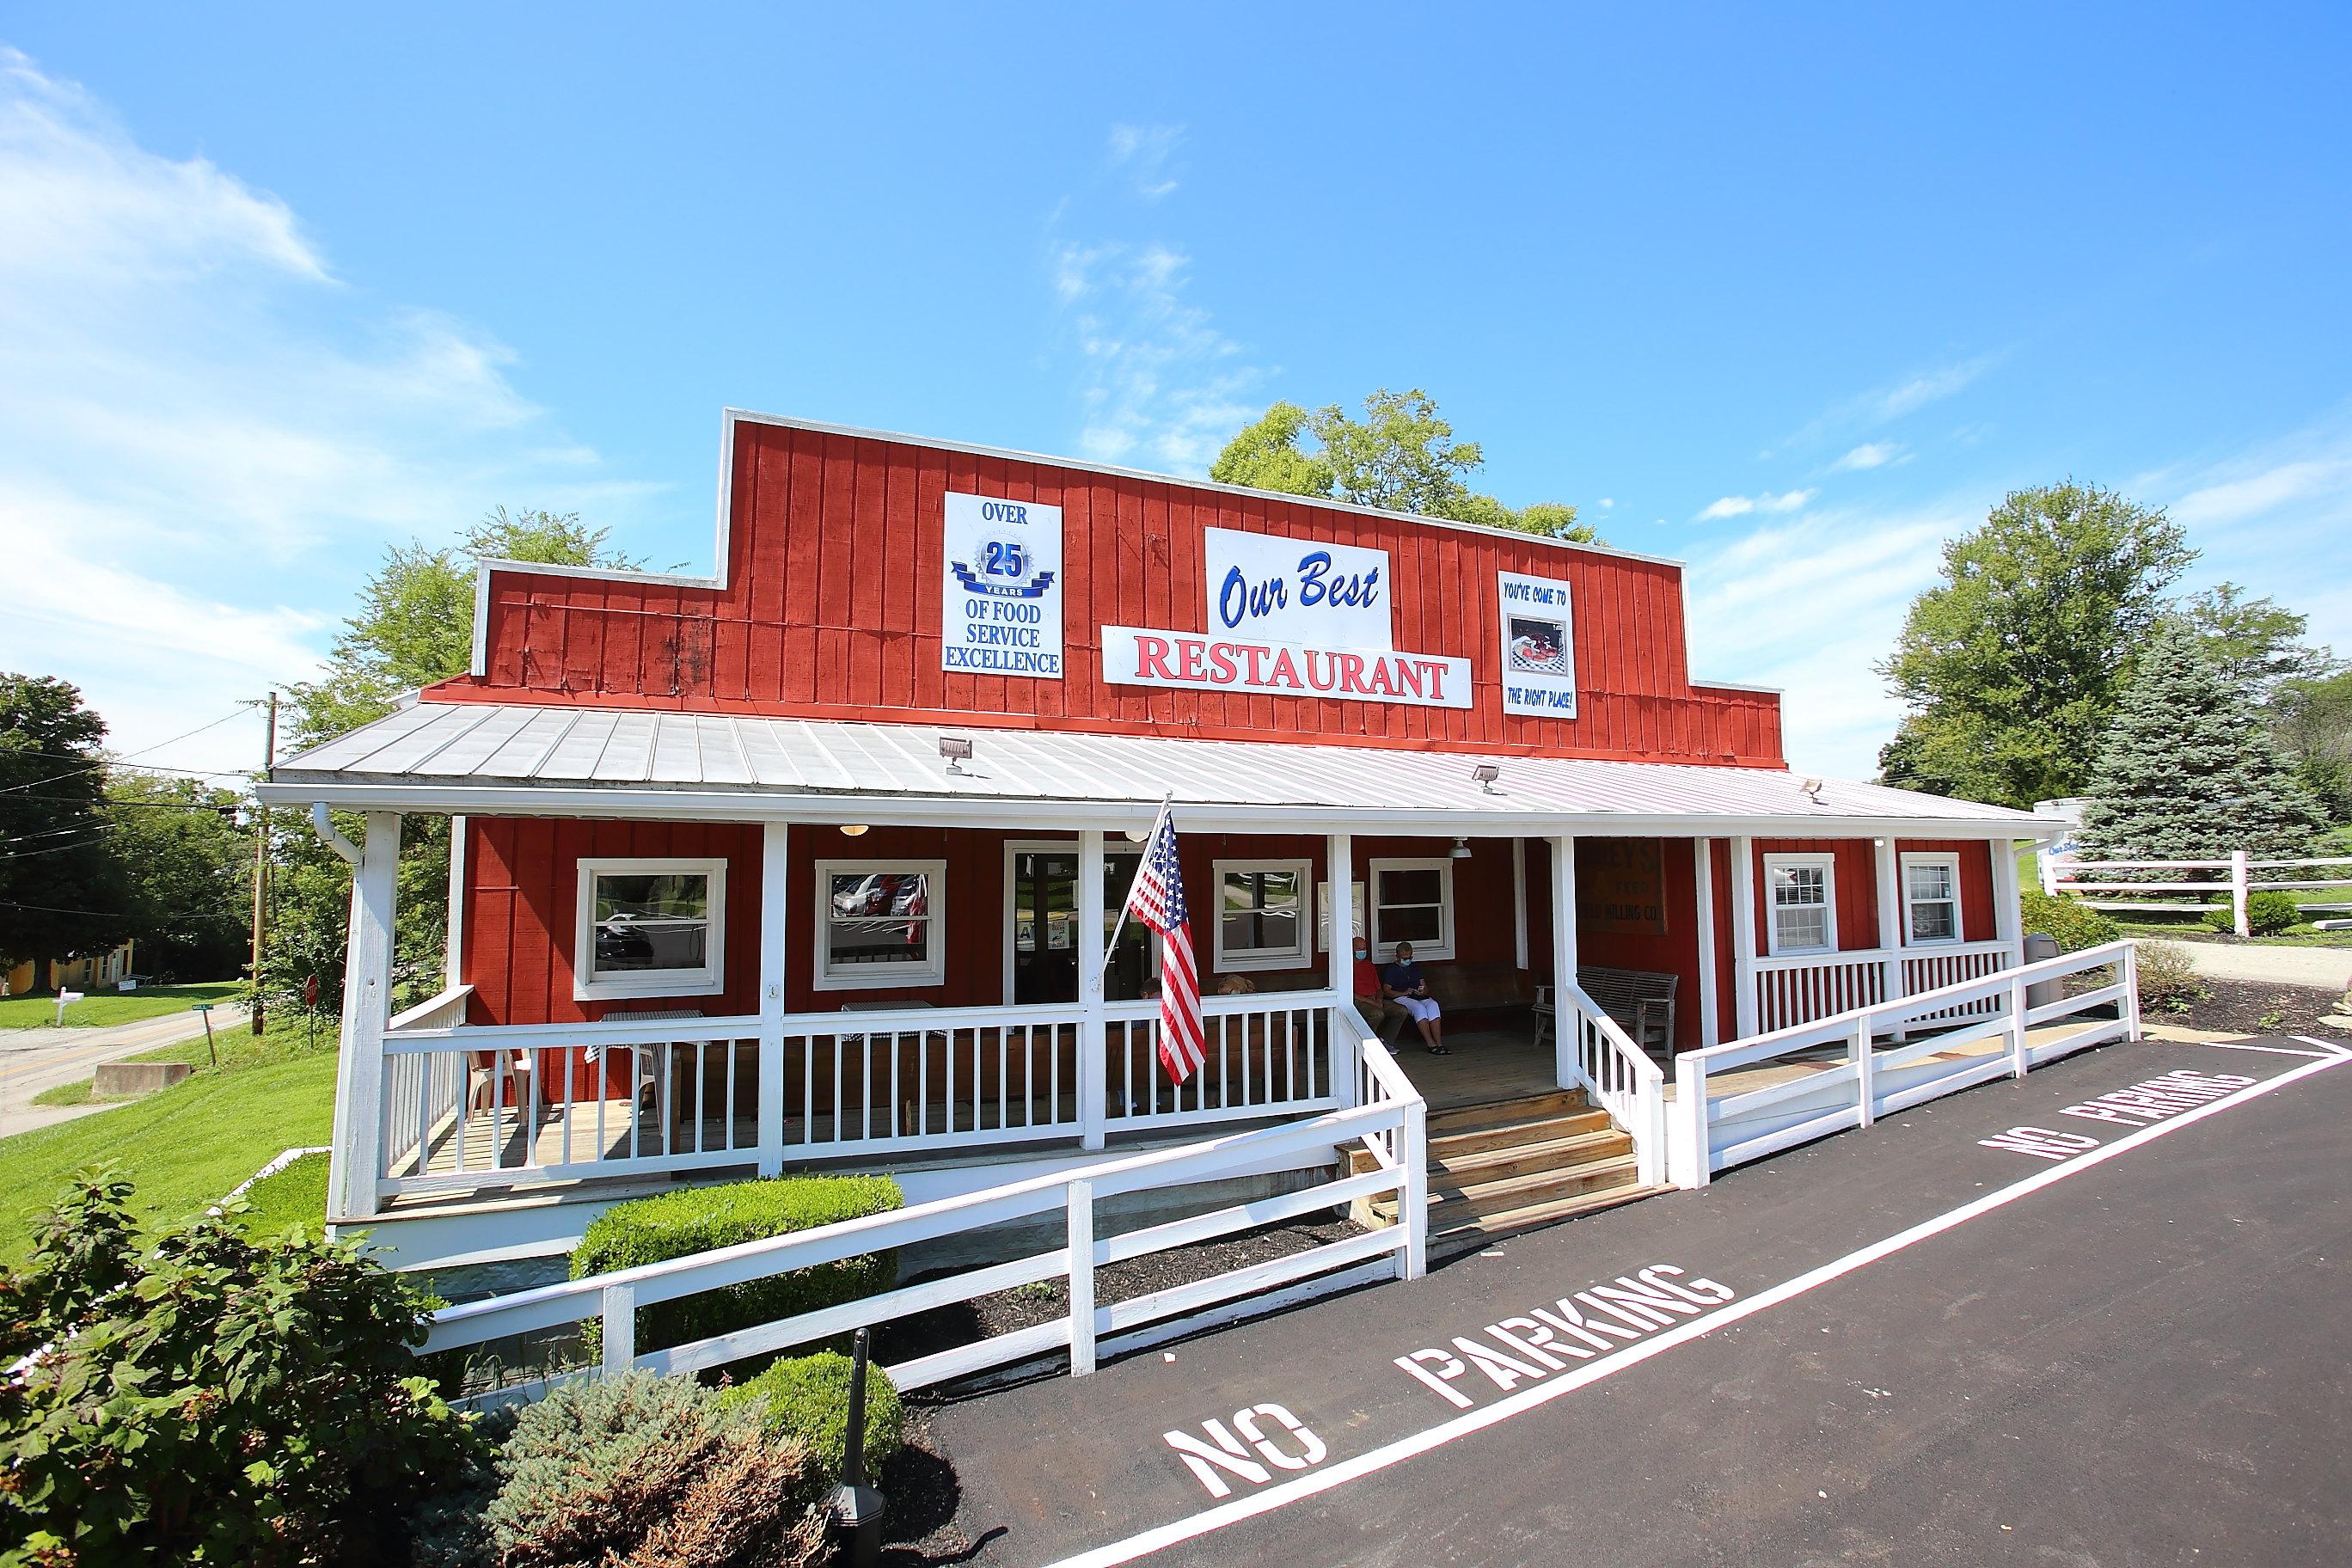 Our Best Restaurant